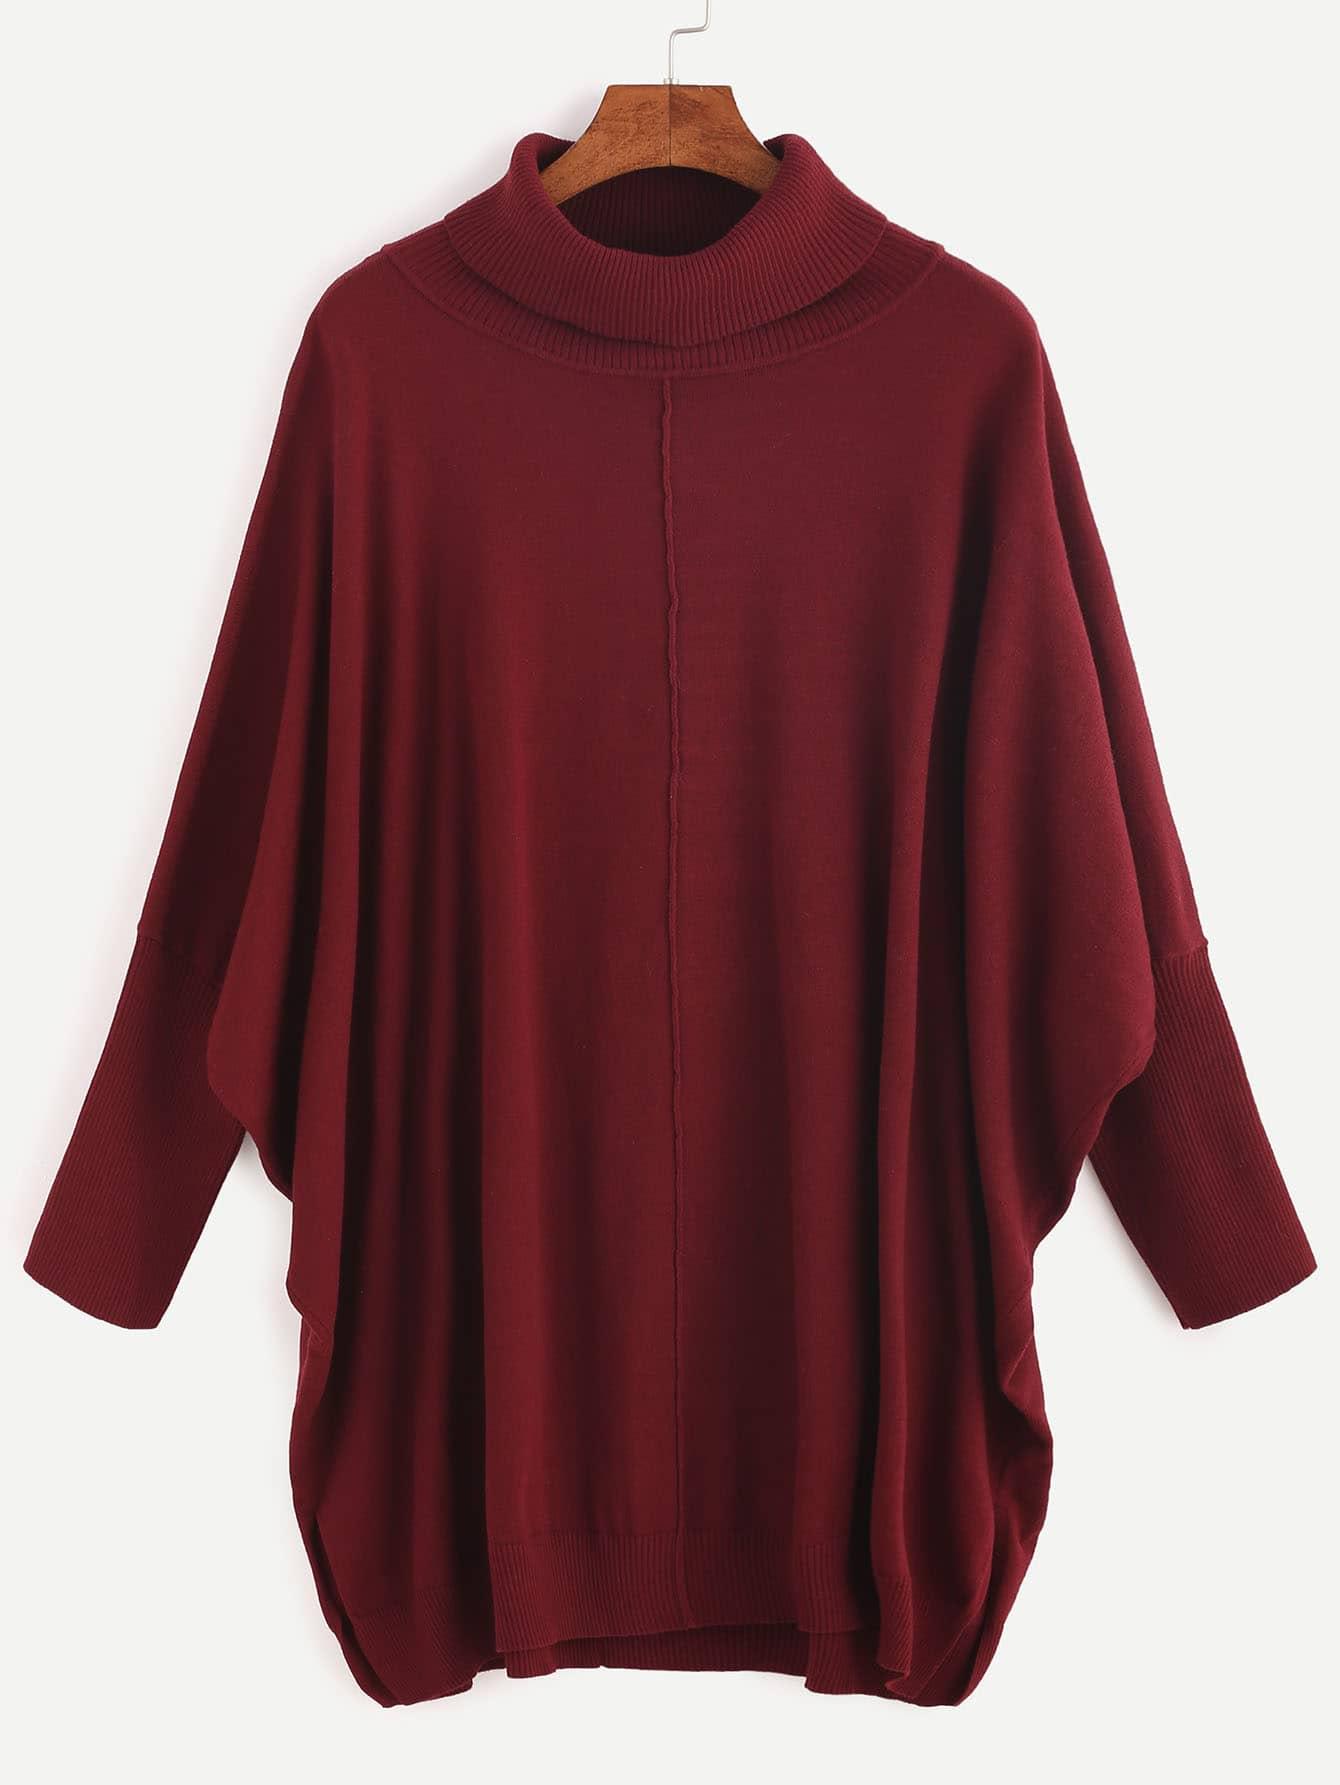 SheIn Burgundy Ribbed Turtleneck Dolman Sleeve Sweater